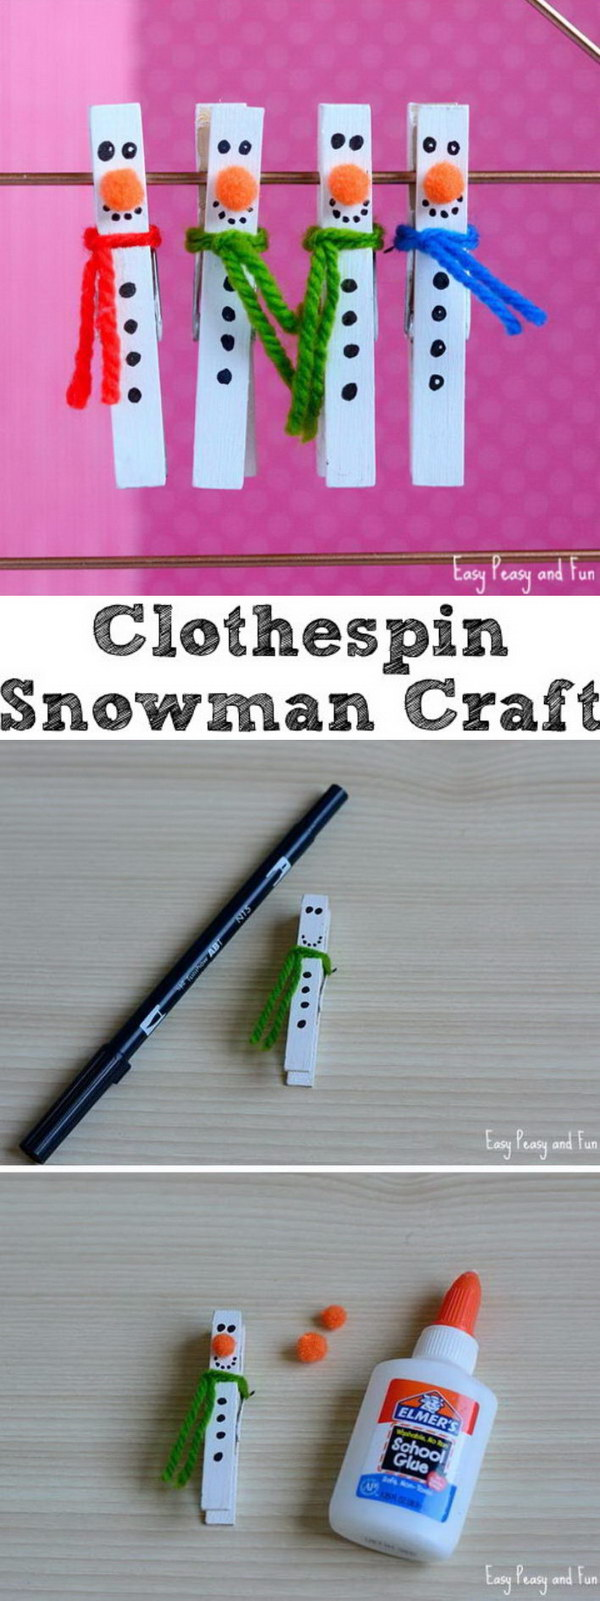 Clothespin Snowman Craft.